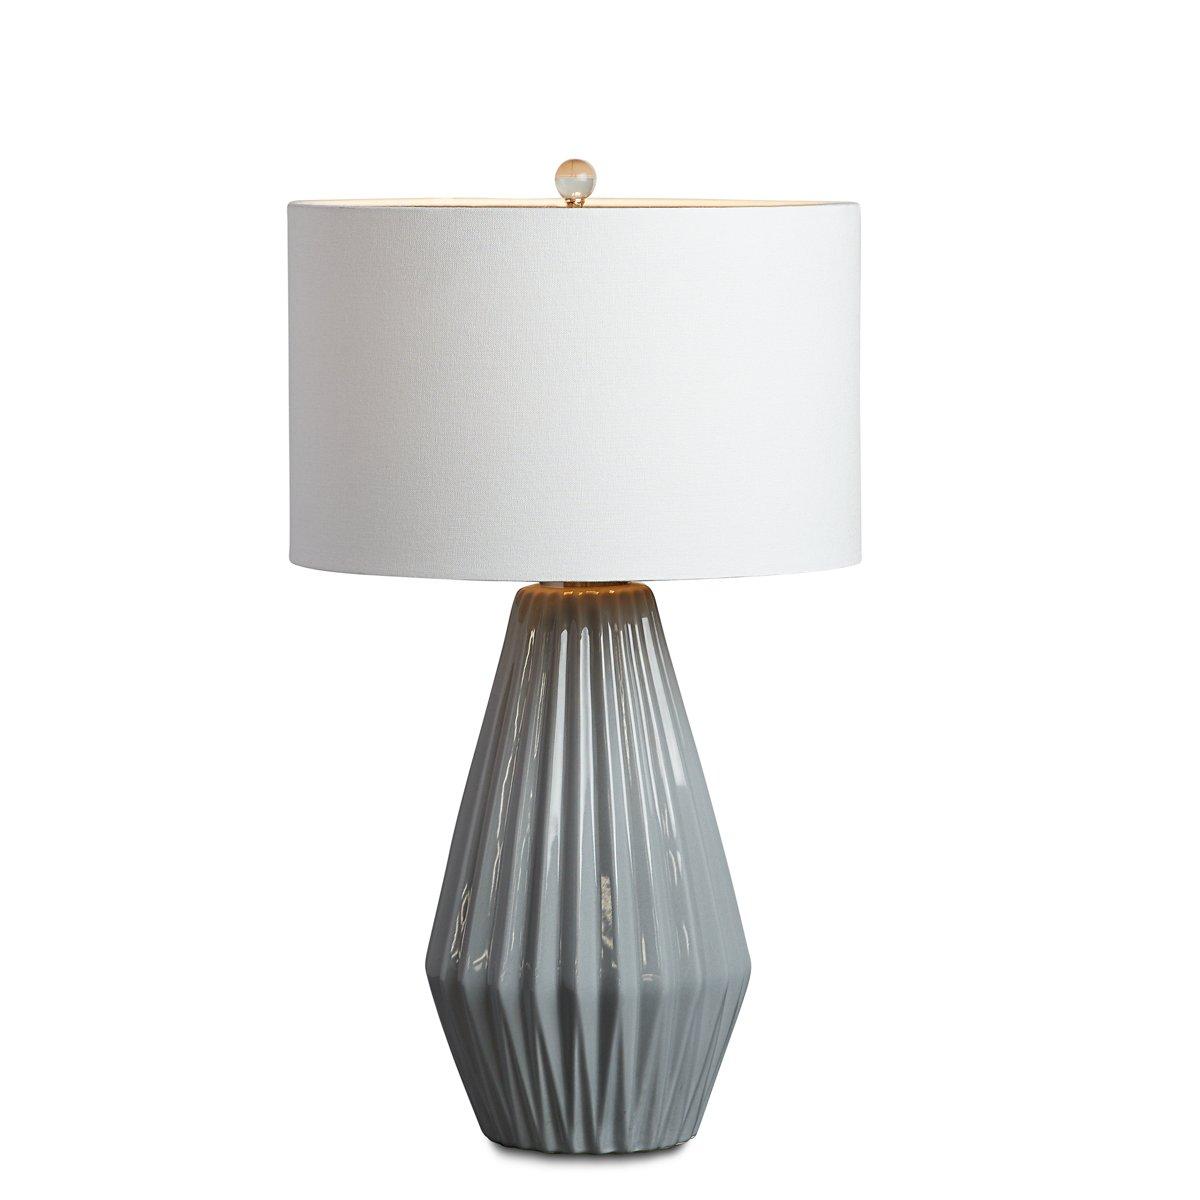 Abner Dark Gray Table Lamp